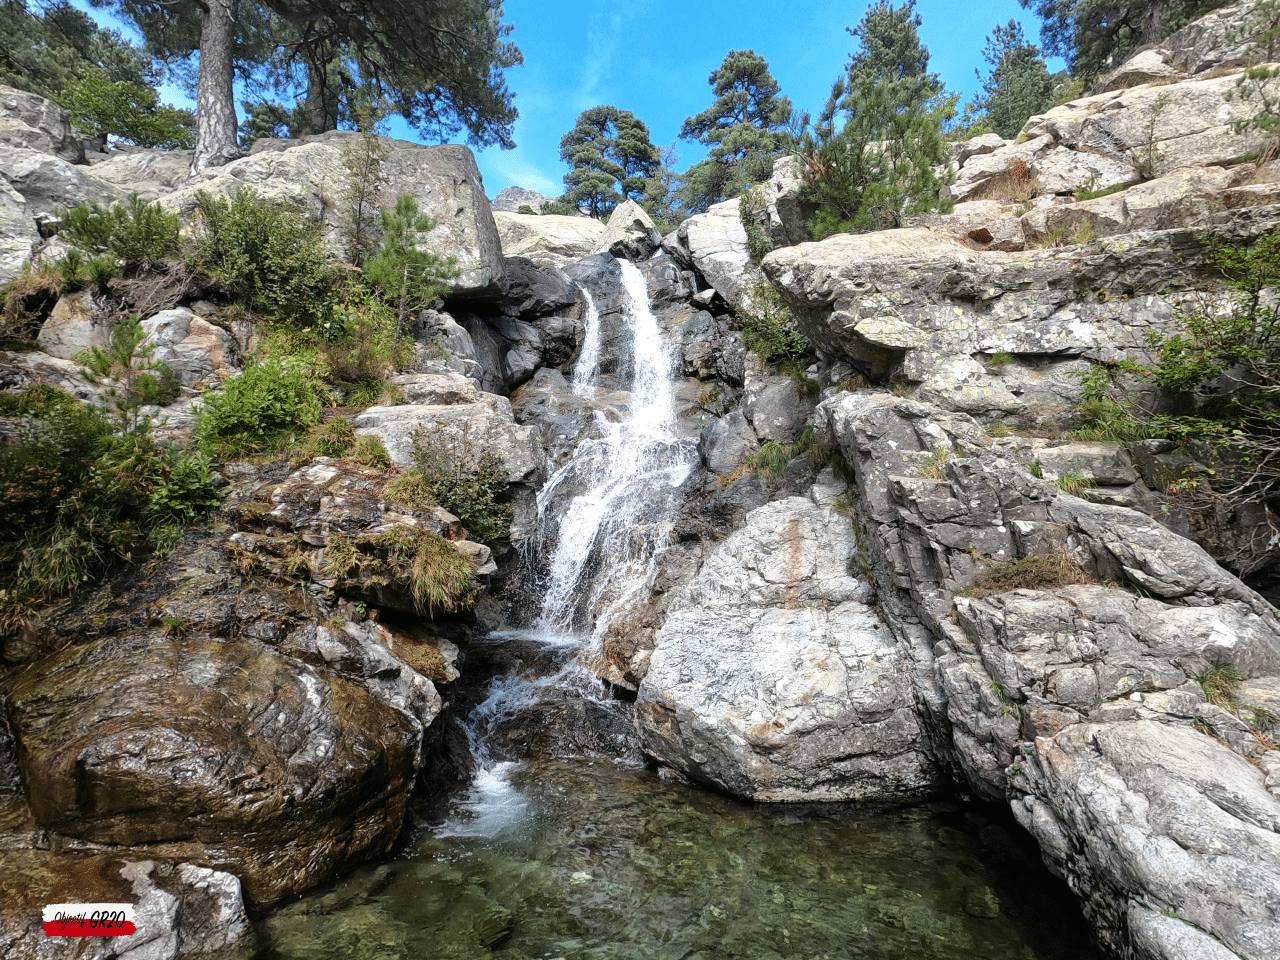 Cascade des Anglais à proximité de Vizzavona